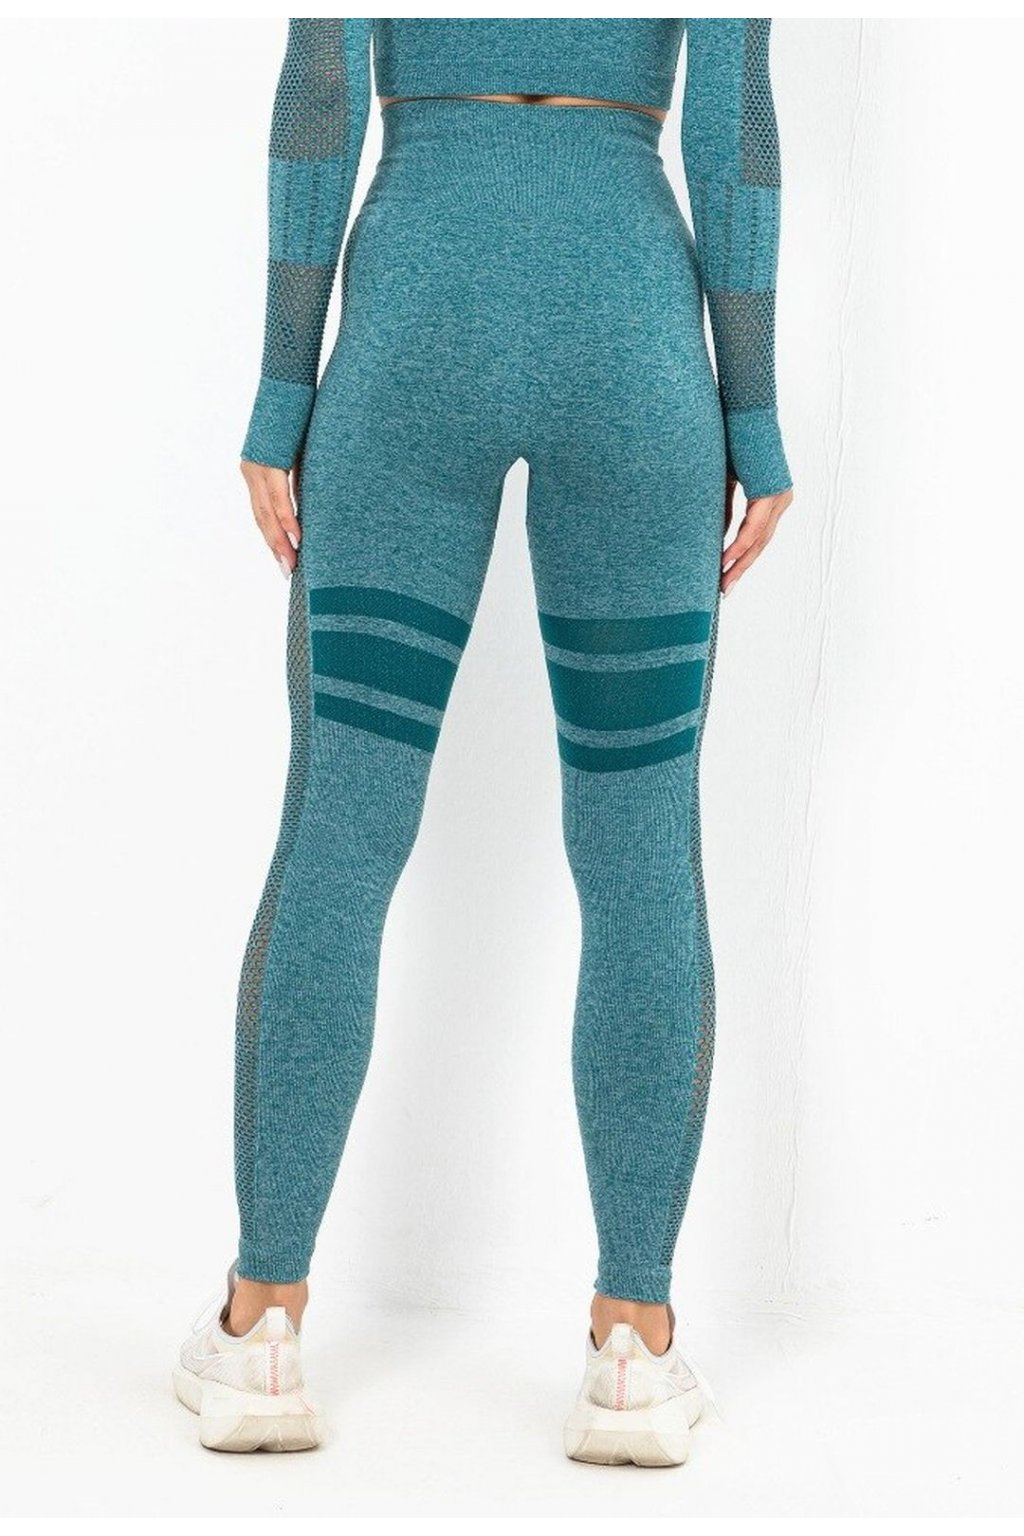 Bombshell Sportswear Seamless 04a02f40 97e6 4010 8ed6 033ff94f9d63